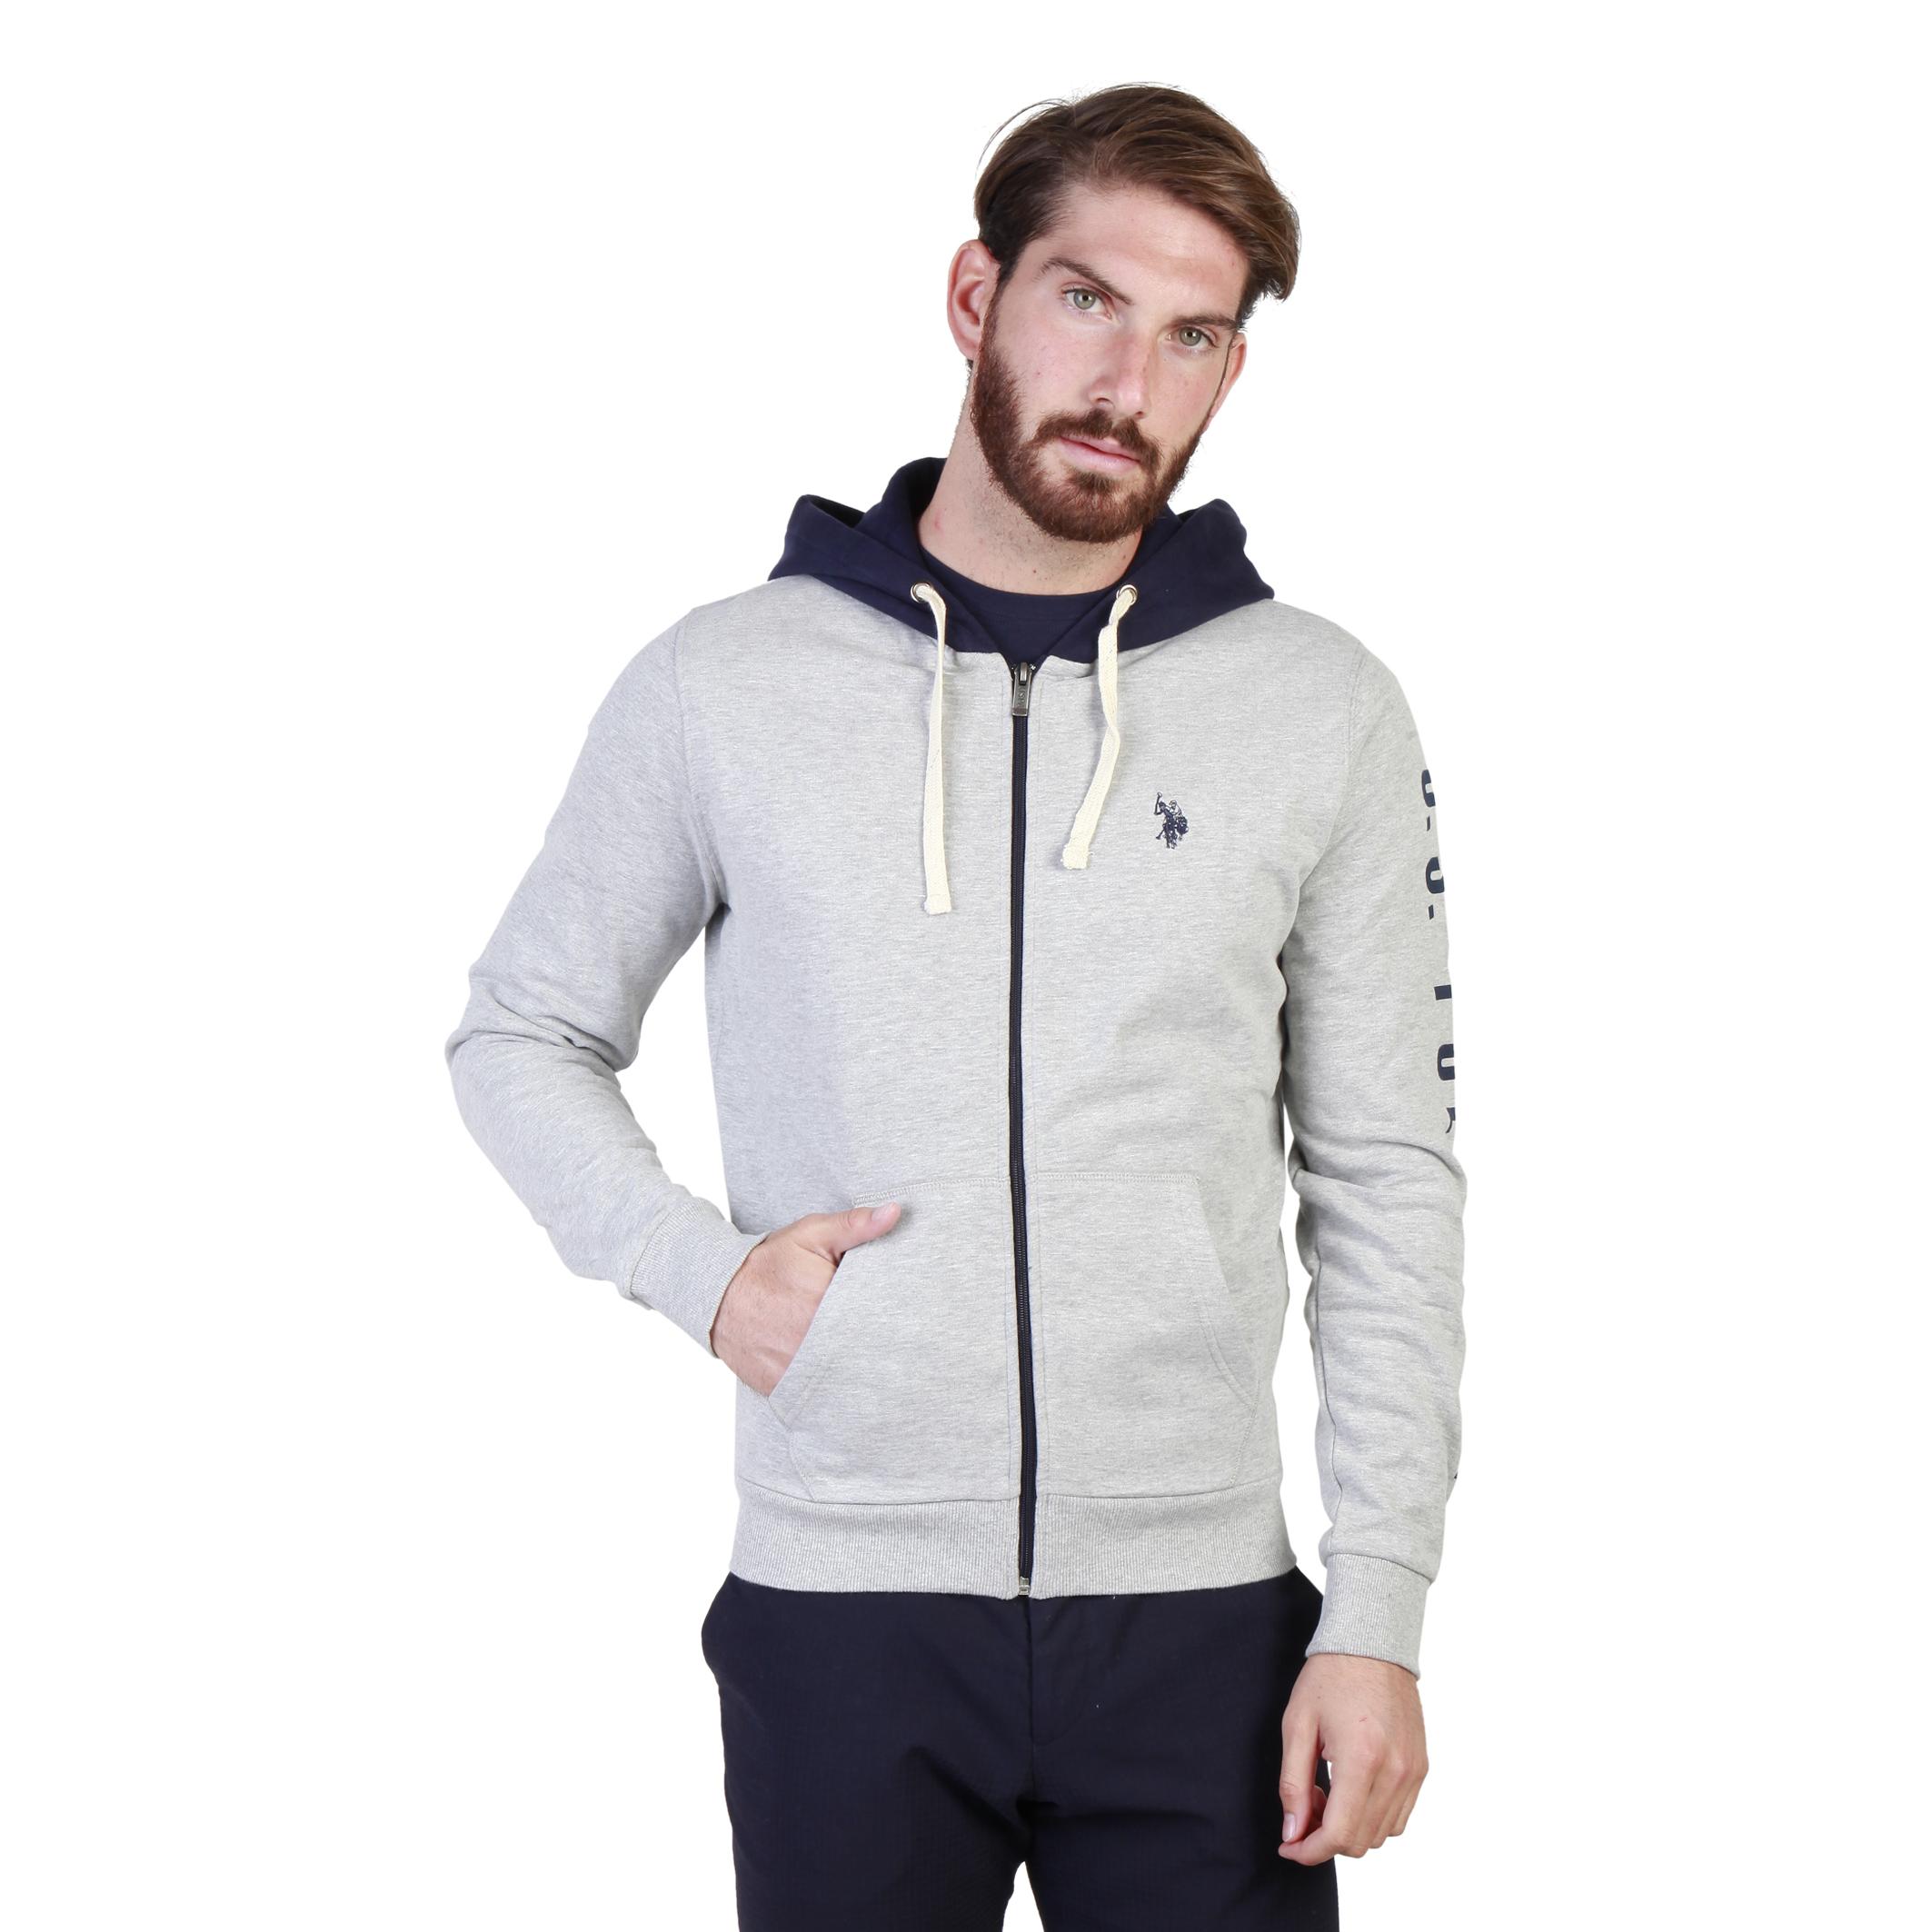 Vestes sport/streetwear  U.S. Polo 43481_47130 grey